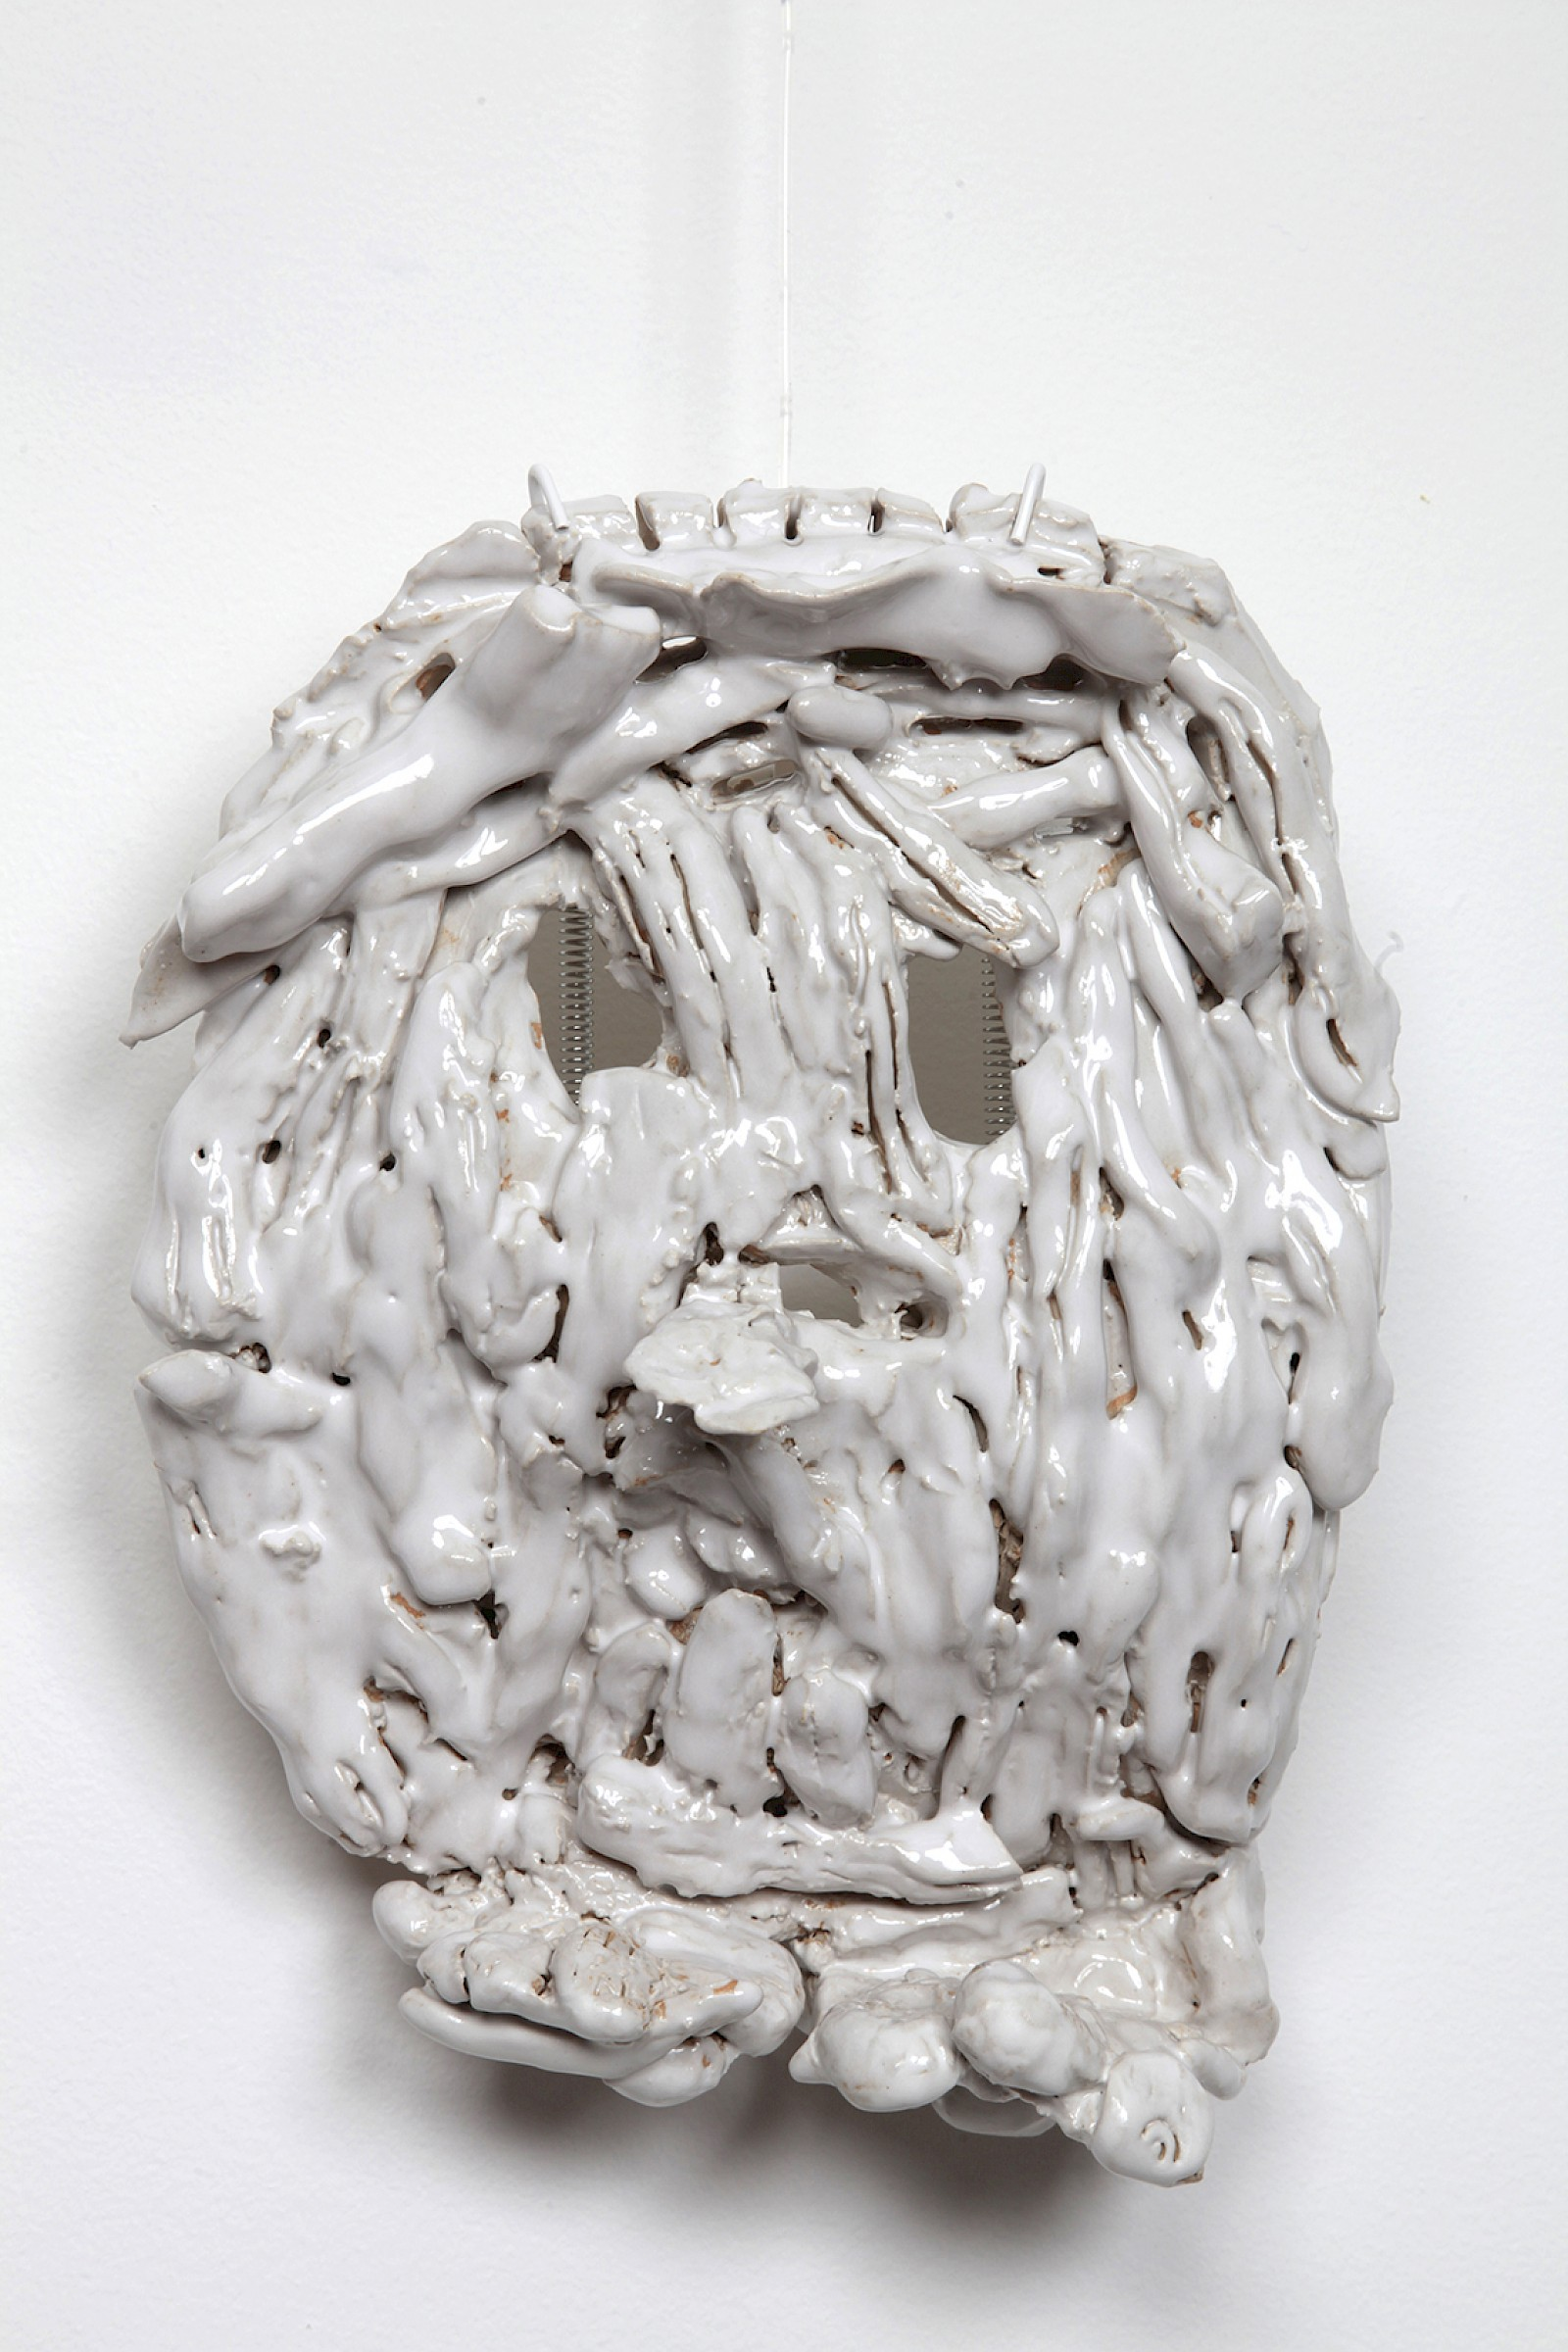 Image - Ceramic mask by Emilie Frosio